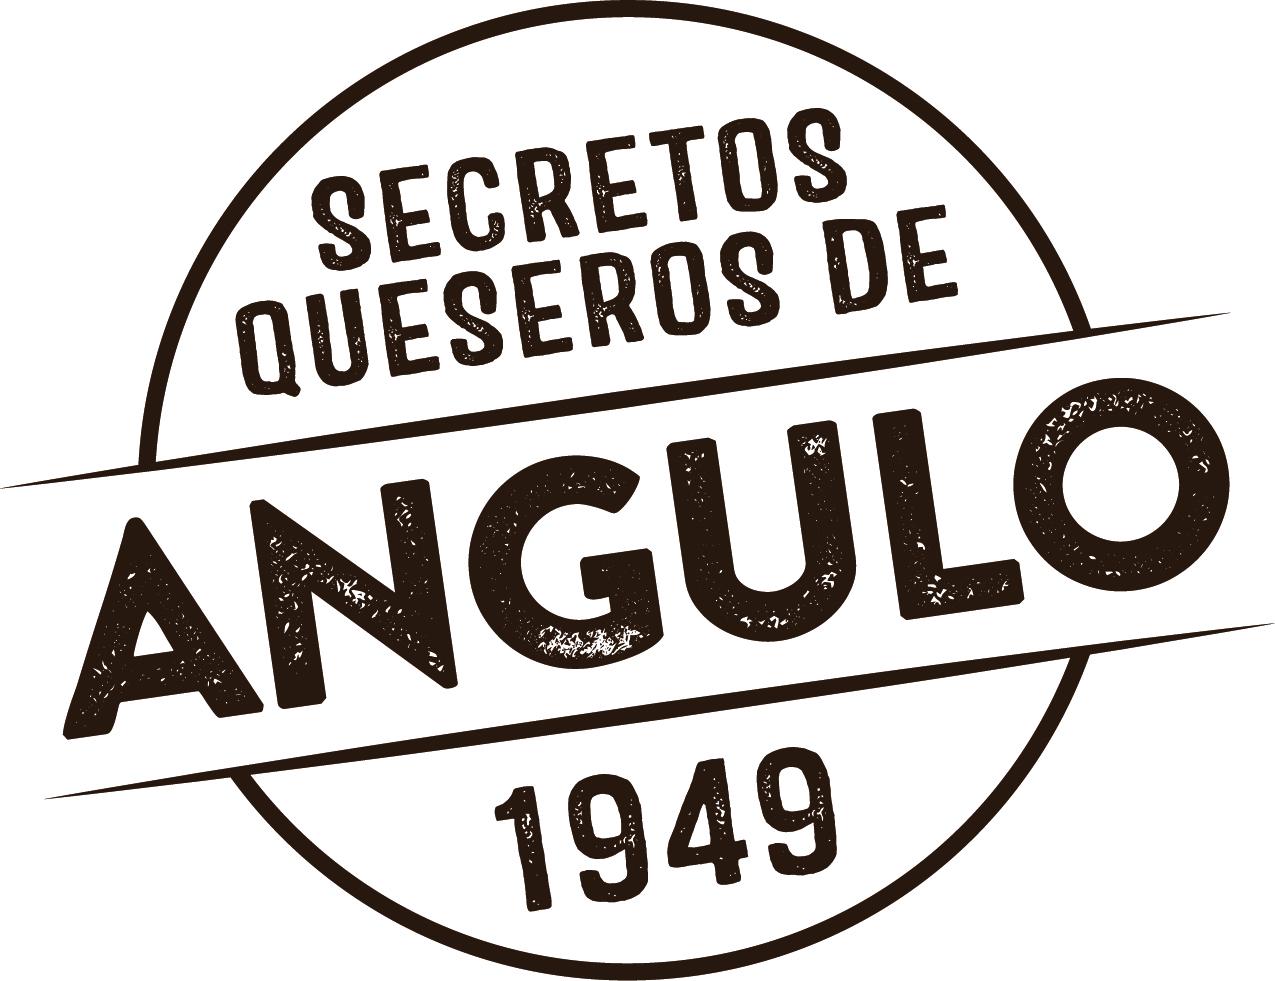 QUESOS ANGULO